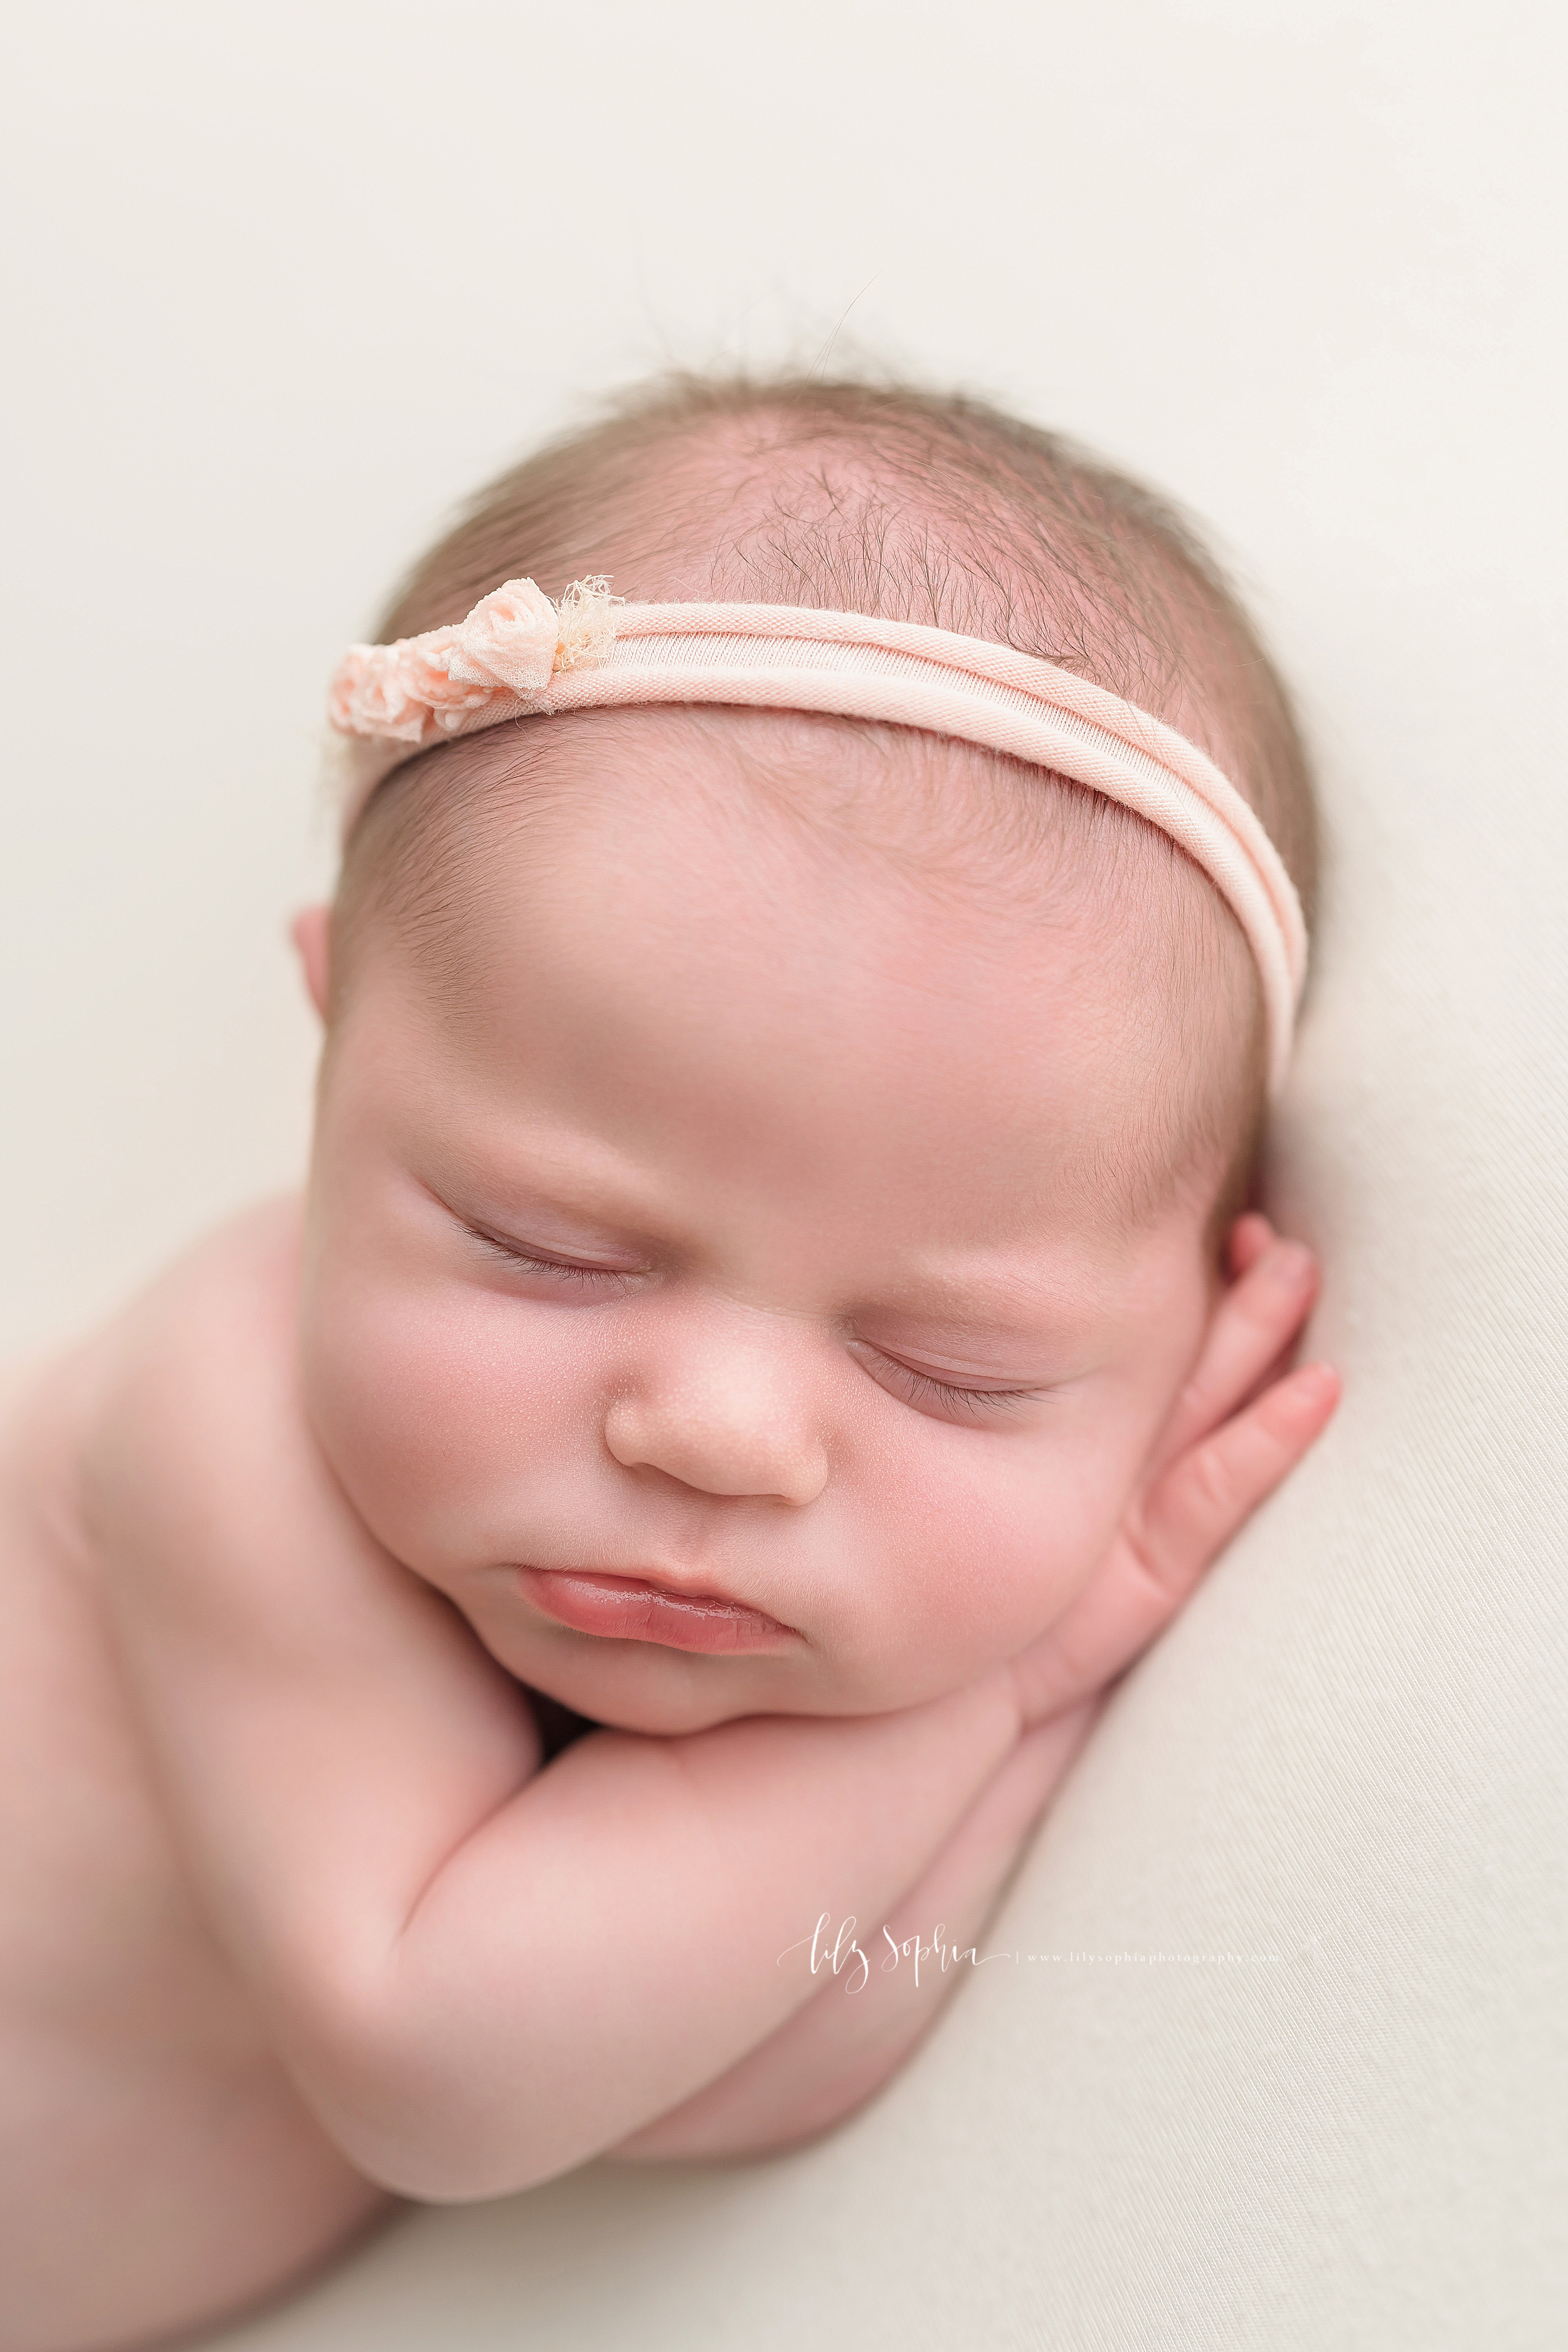 atlanta-decatur-candler-park-sandy-springs-buckhead-virginia-highlands-west-end-decatur-lily-sophia-photography-studio-newborn-baby-girl-family-parents-session_1835.jpg